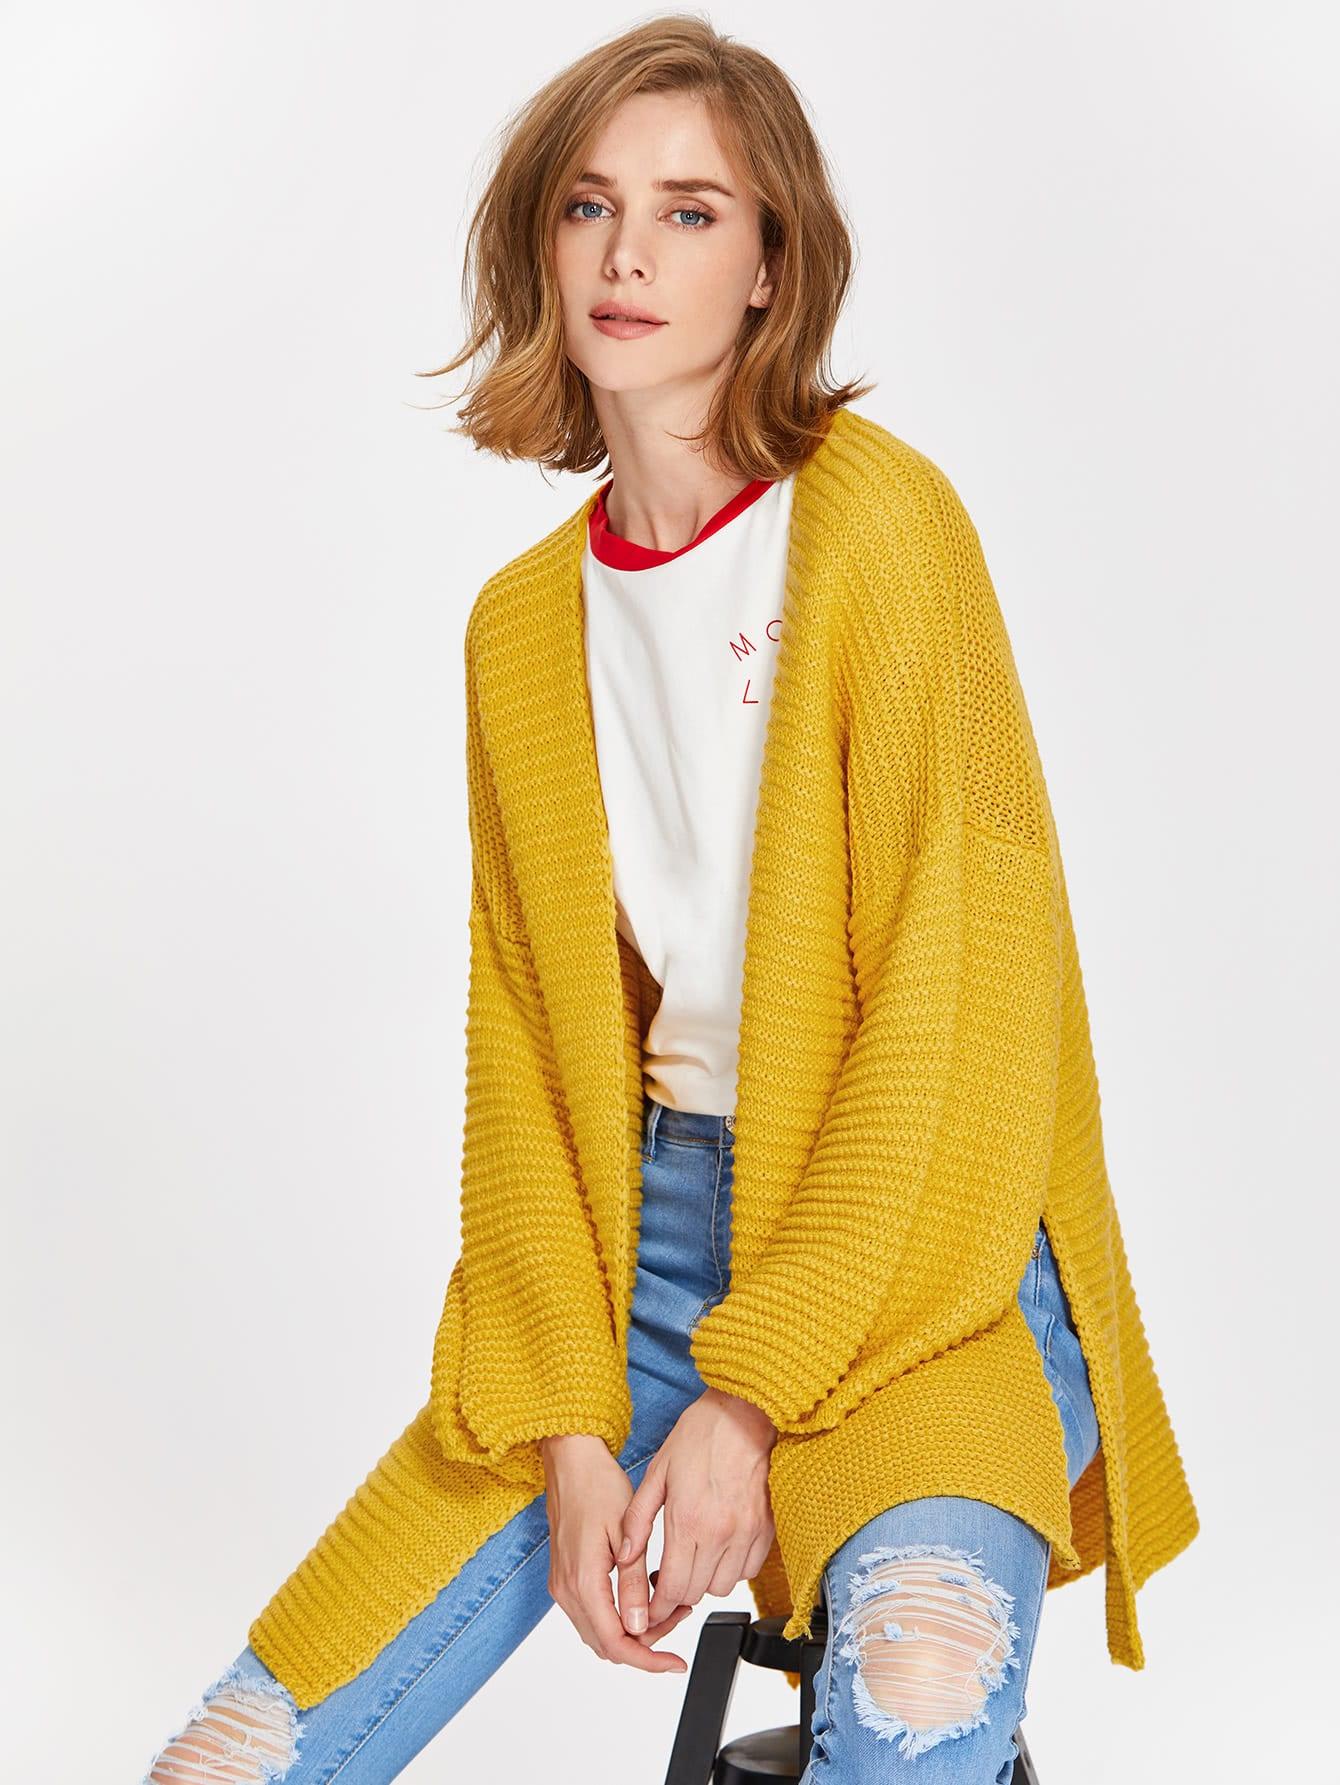 Drop Shoulder Lantern Sleeve Slit Textured Cardigan sweater170704451